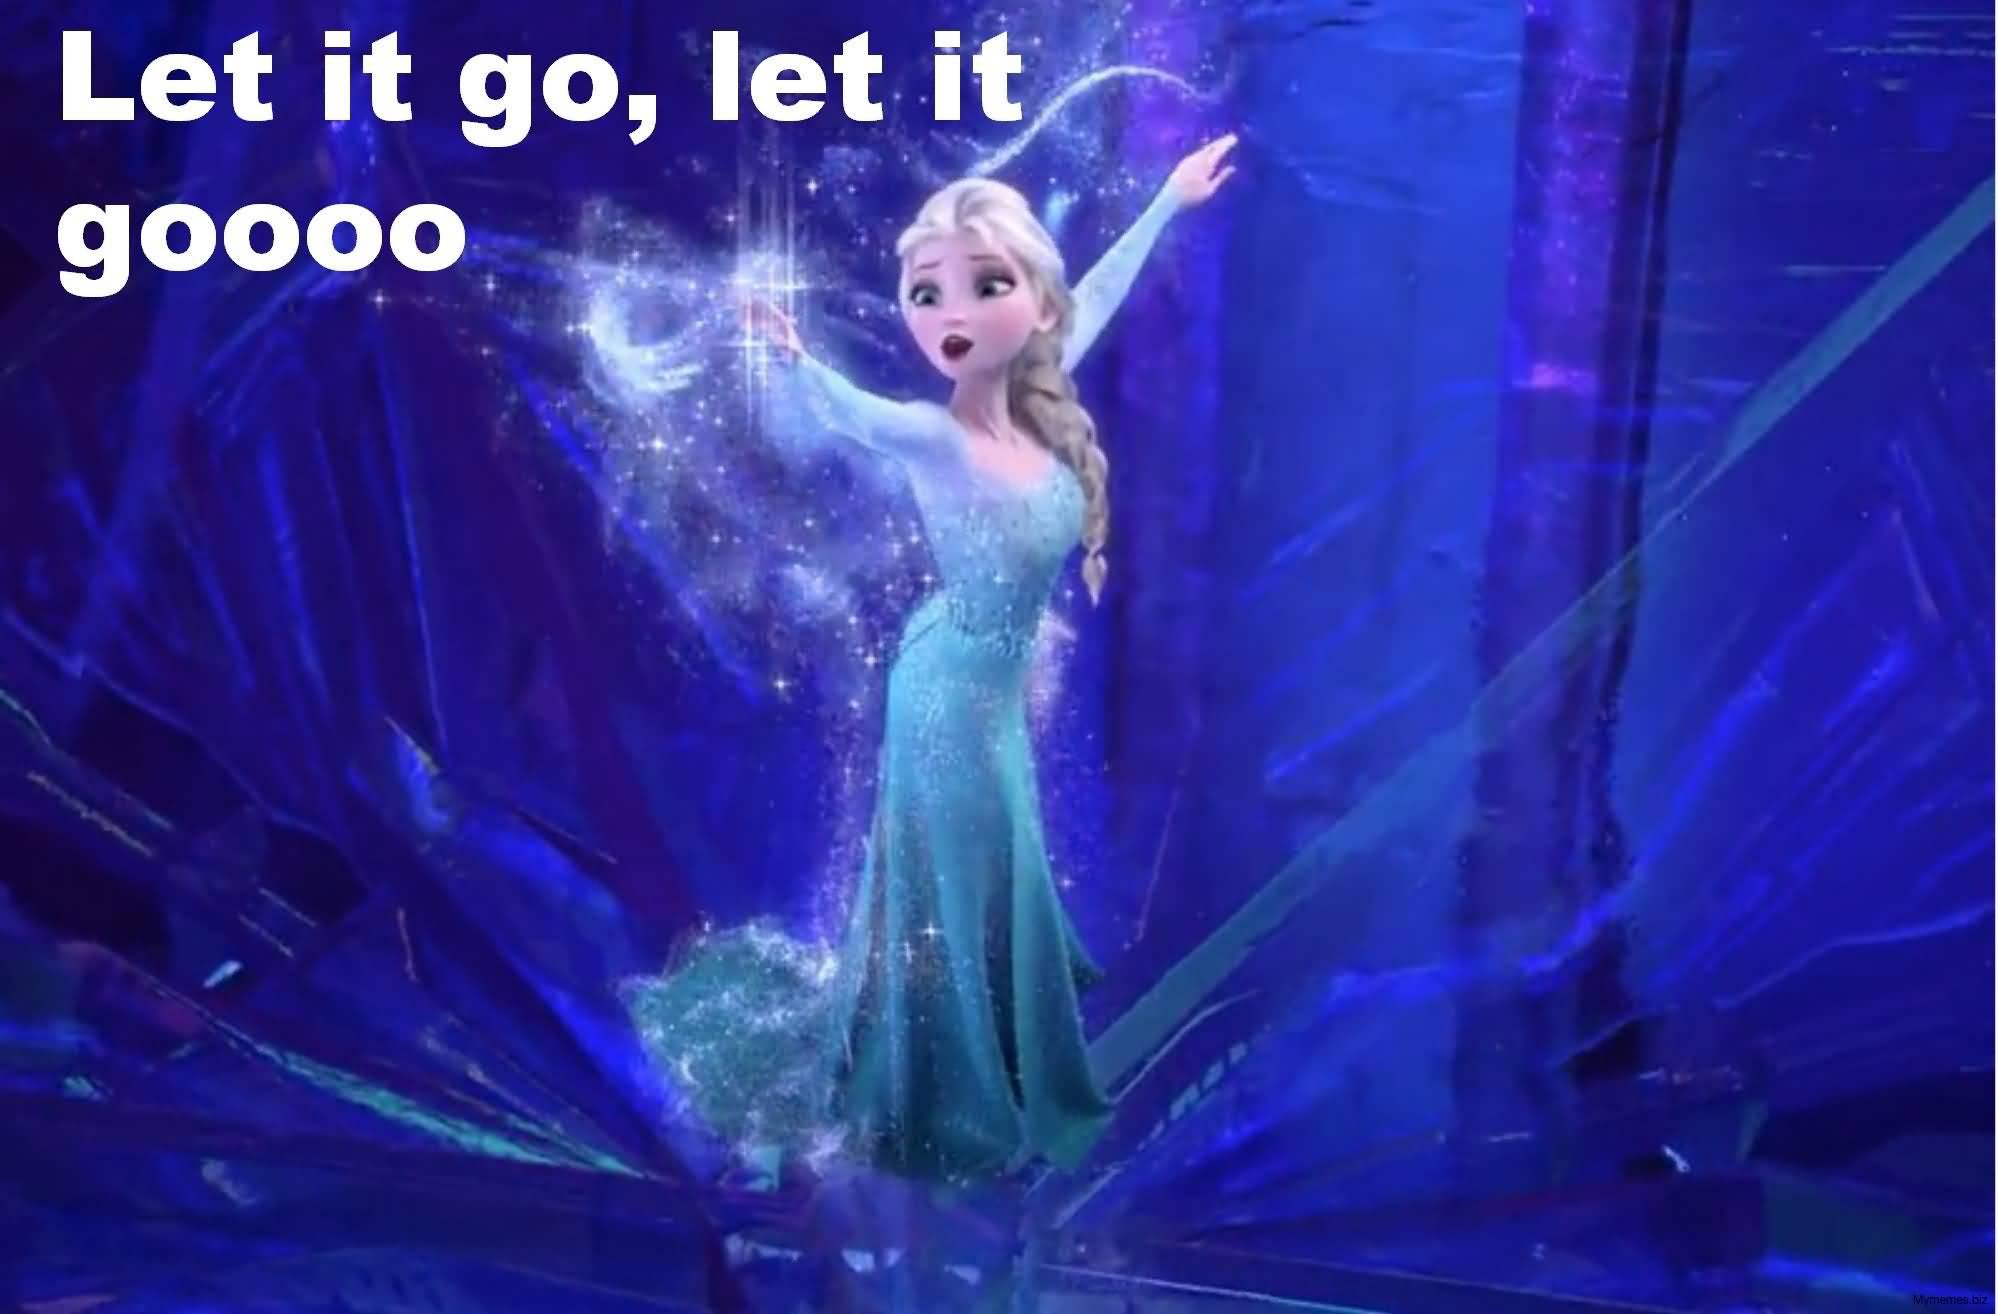 Let It Go Meme Image Photo Joke 13